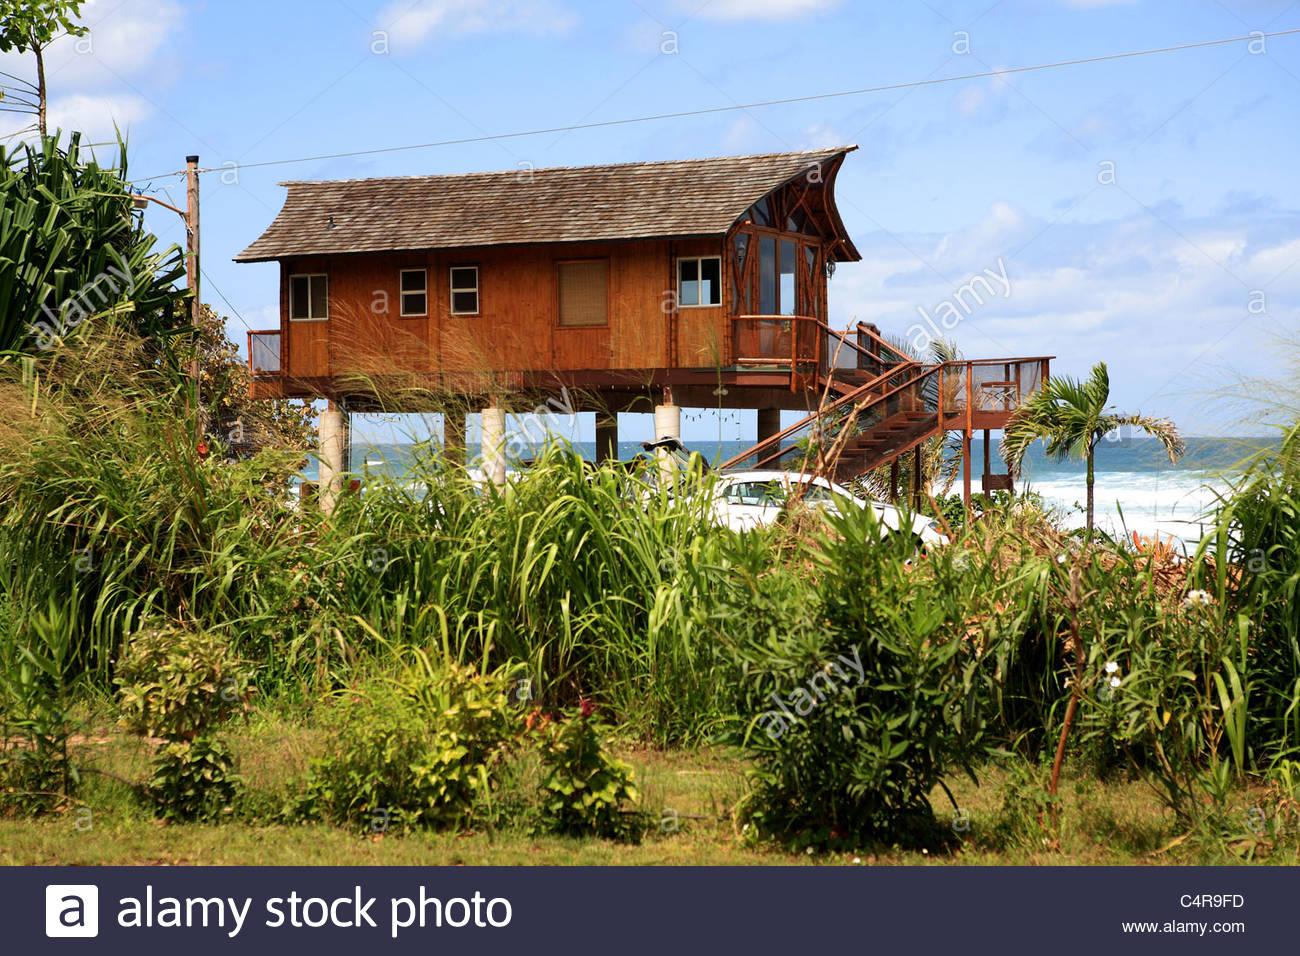 United States, Hawaii, Oahu island, North Shore, house on ...